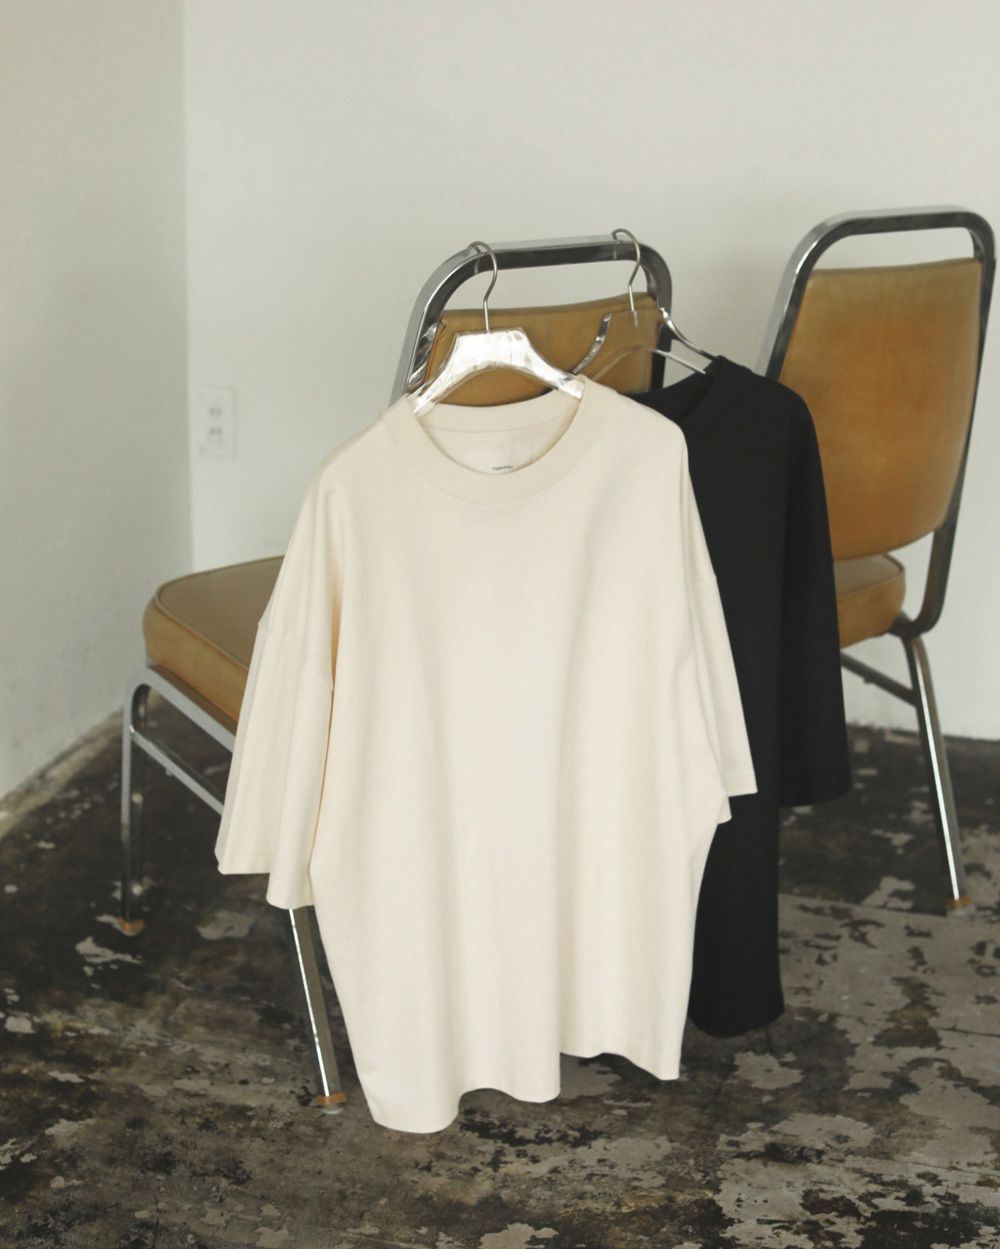 Halfsleeve Over T-shirts